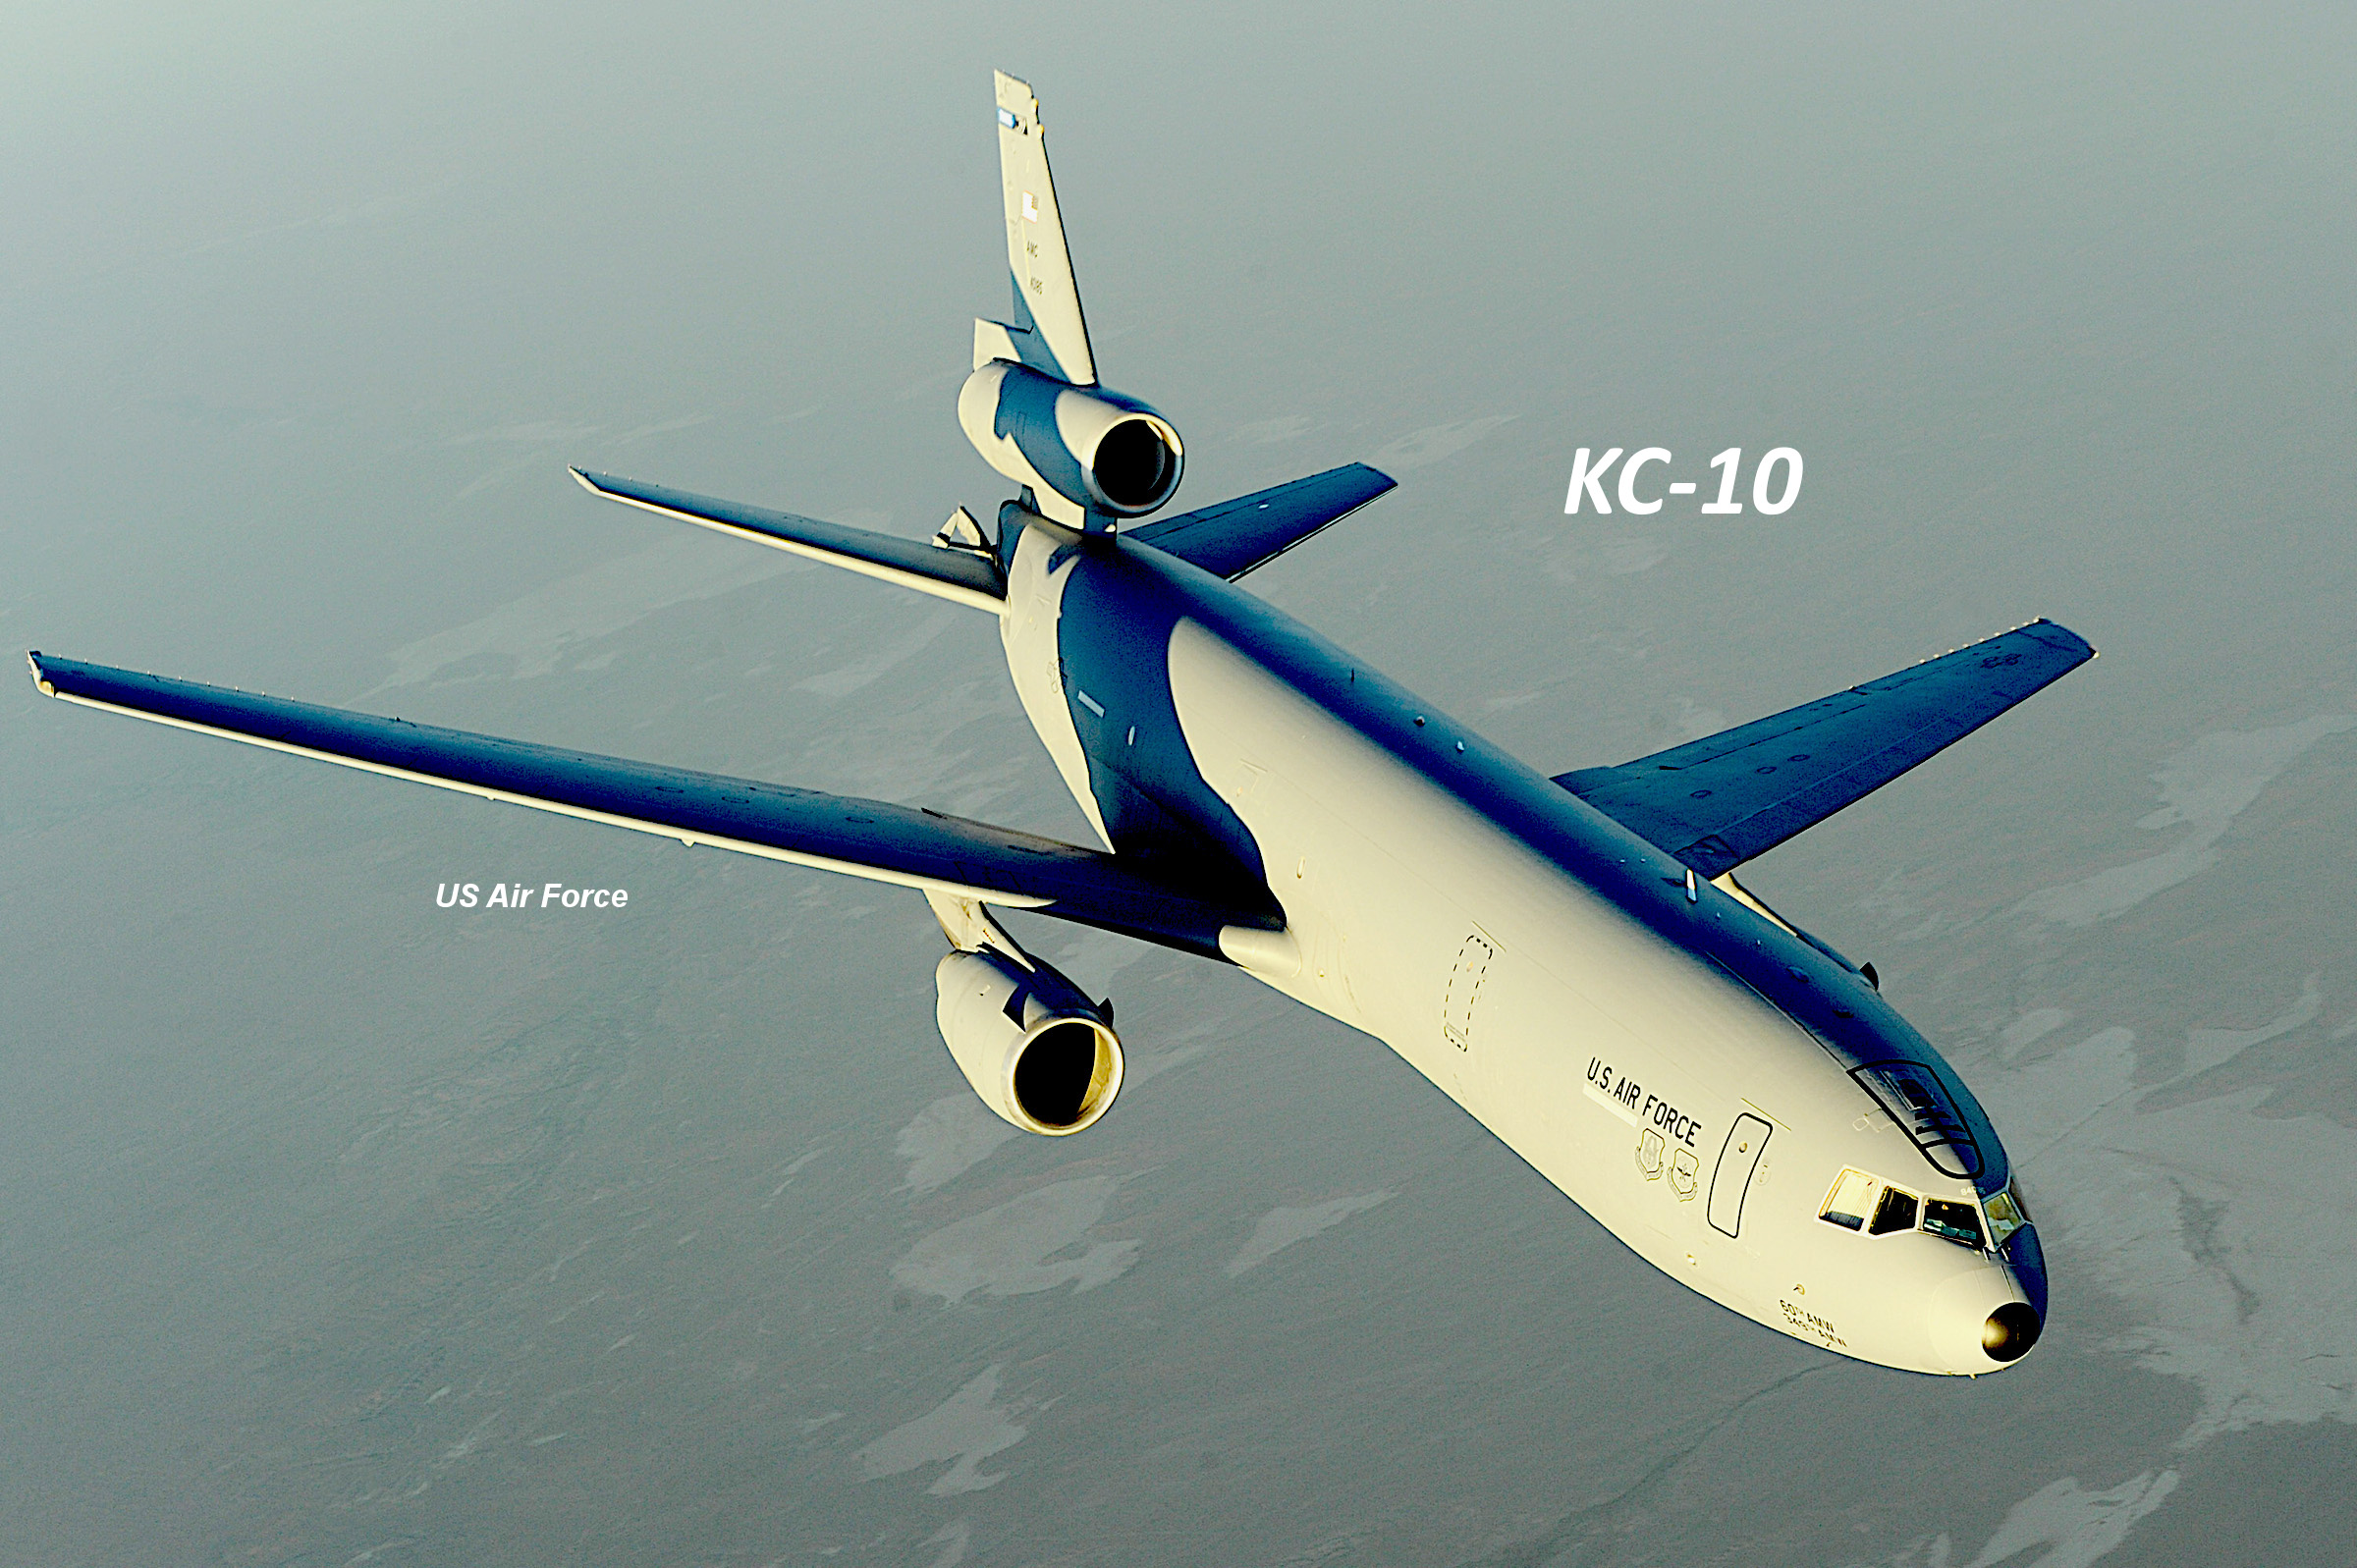 kc-10 wasi web1.JPG